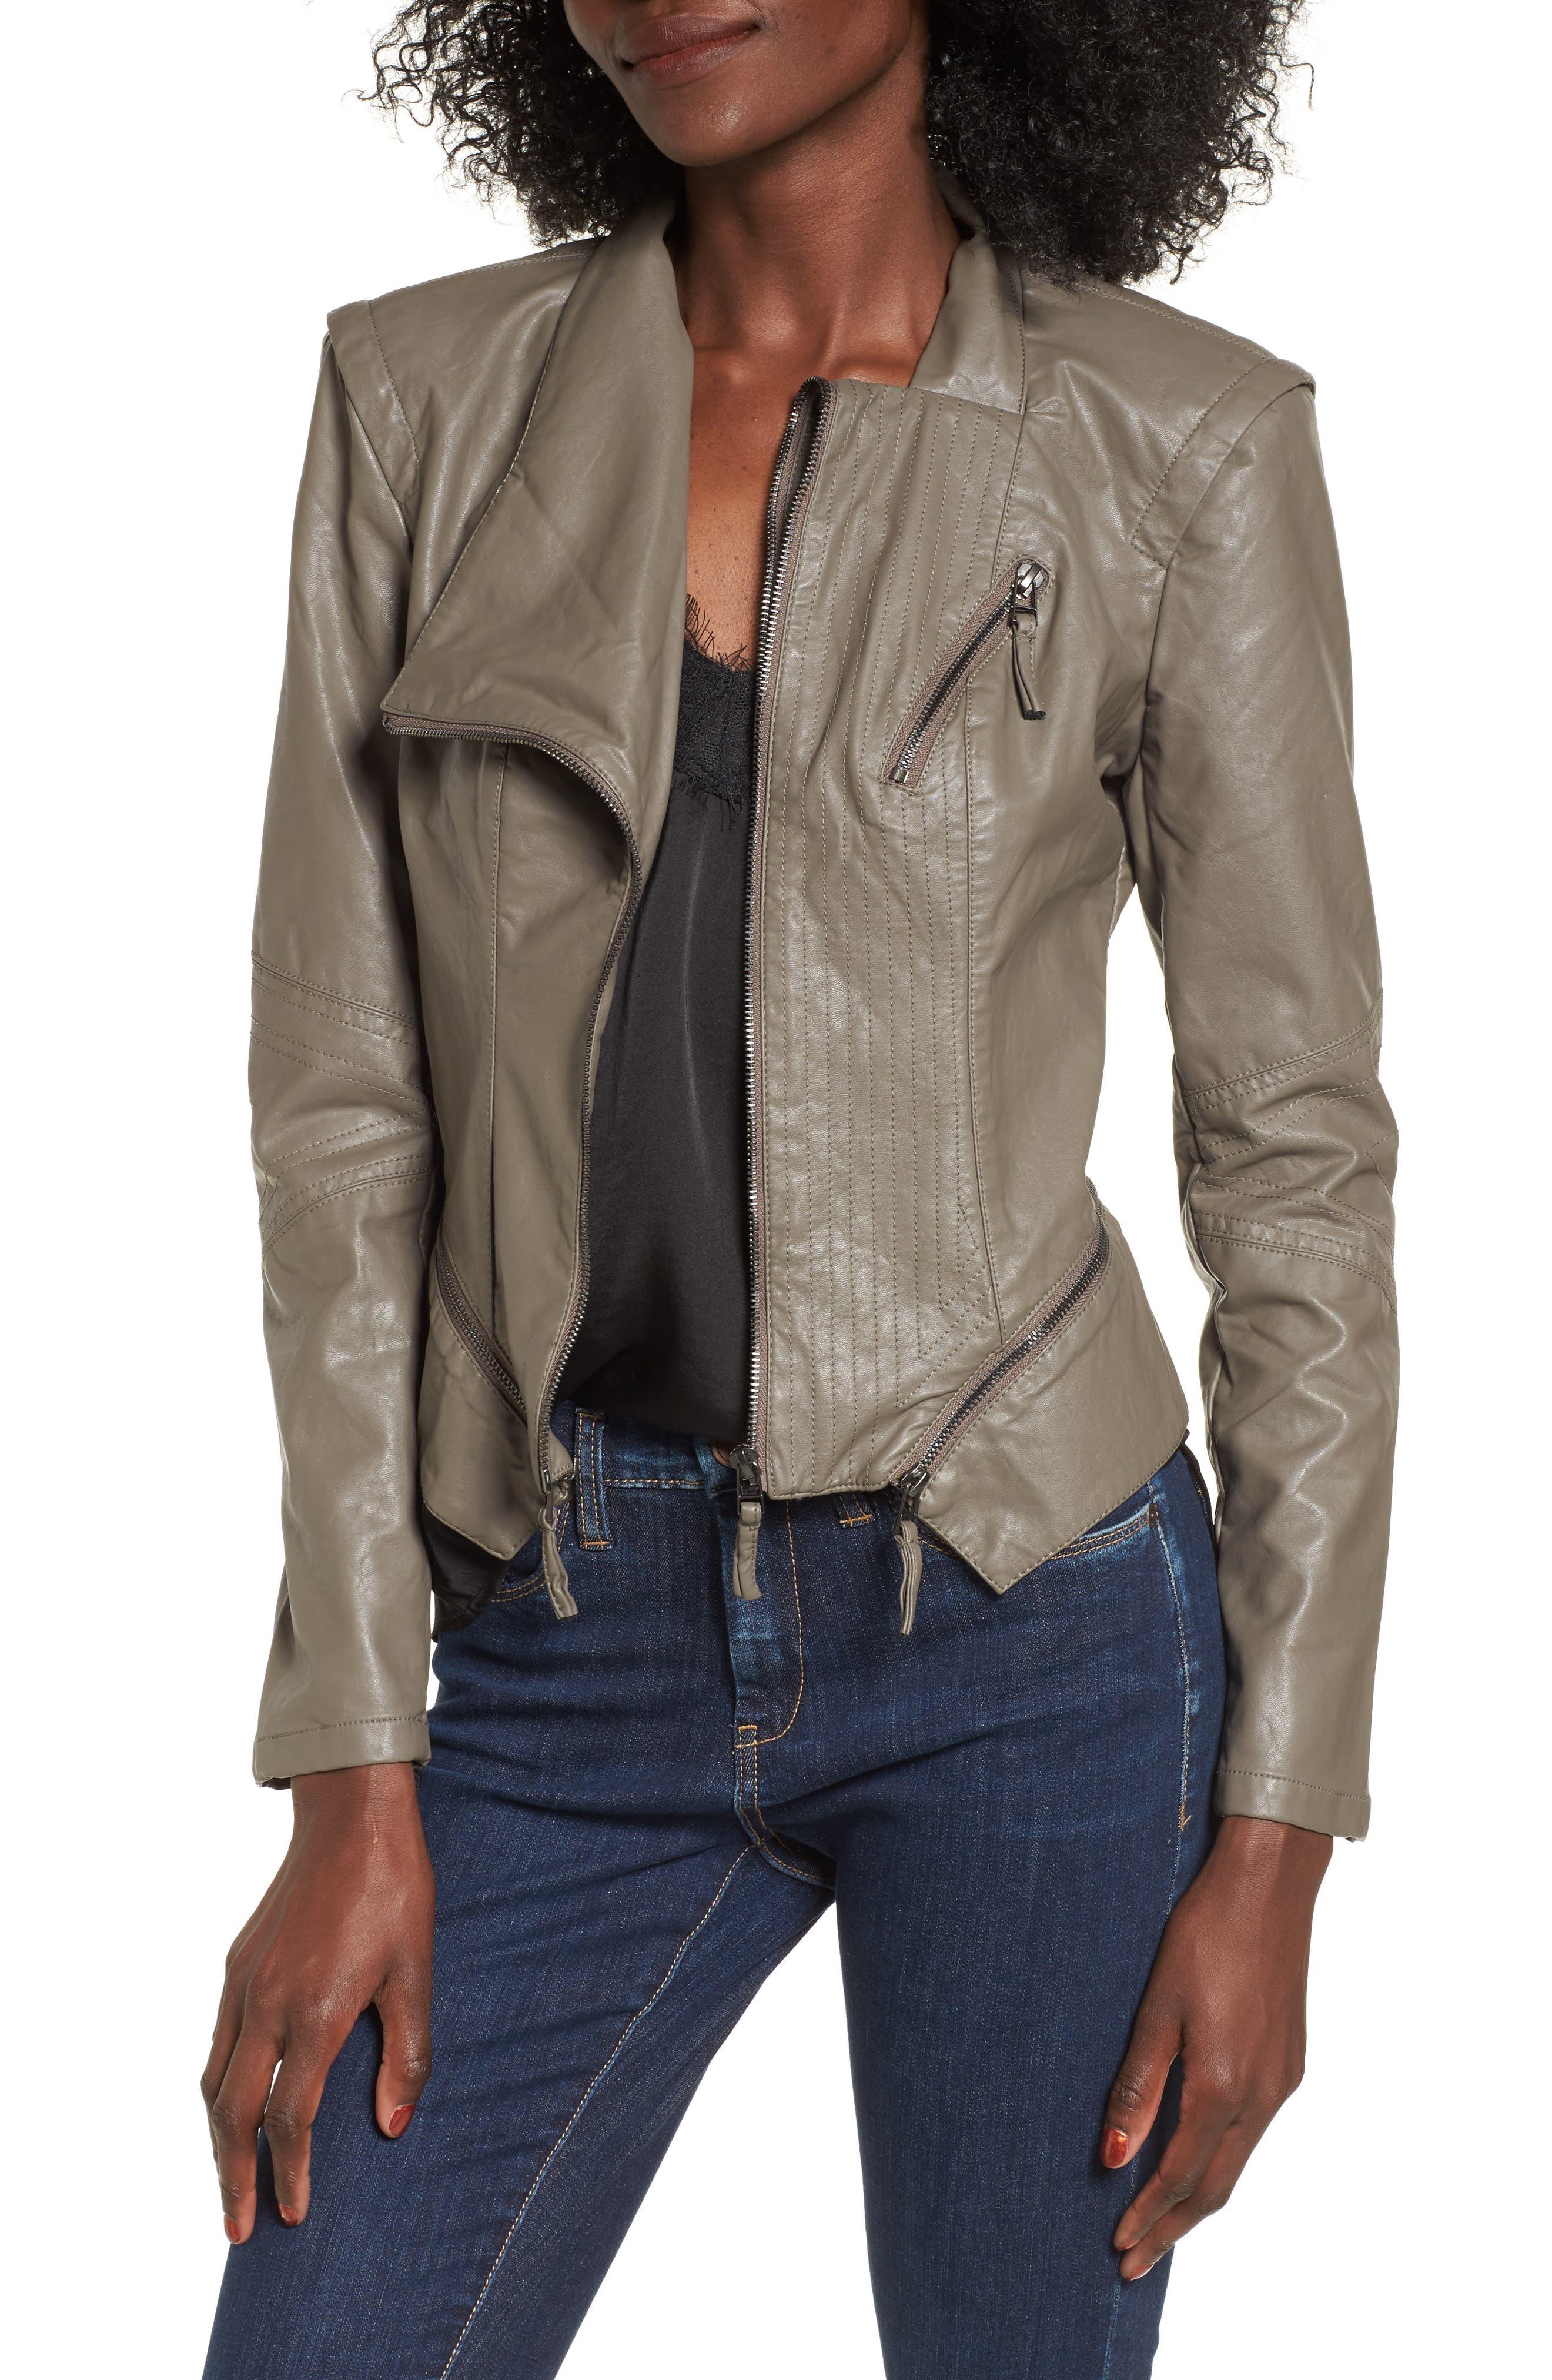 Leather jacket repair vancouver - Leather Jacket Repair Vancouver 45